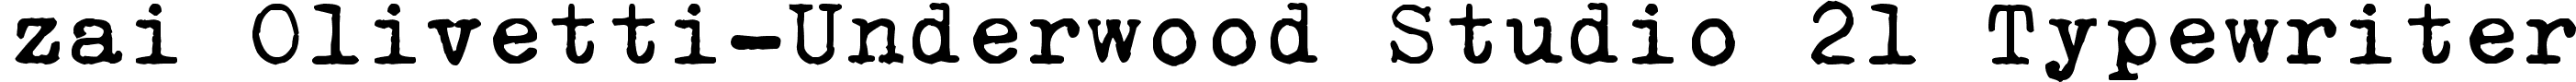 zai Olivetti-Underwood Studio 21 Typewriter